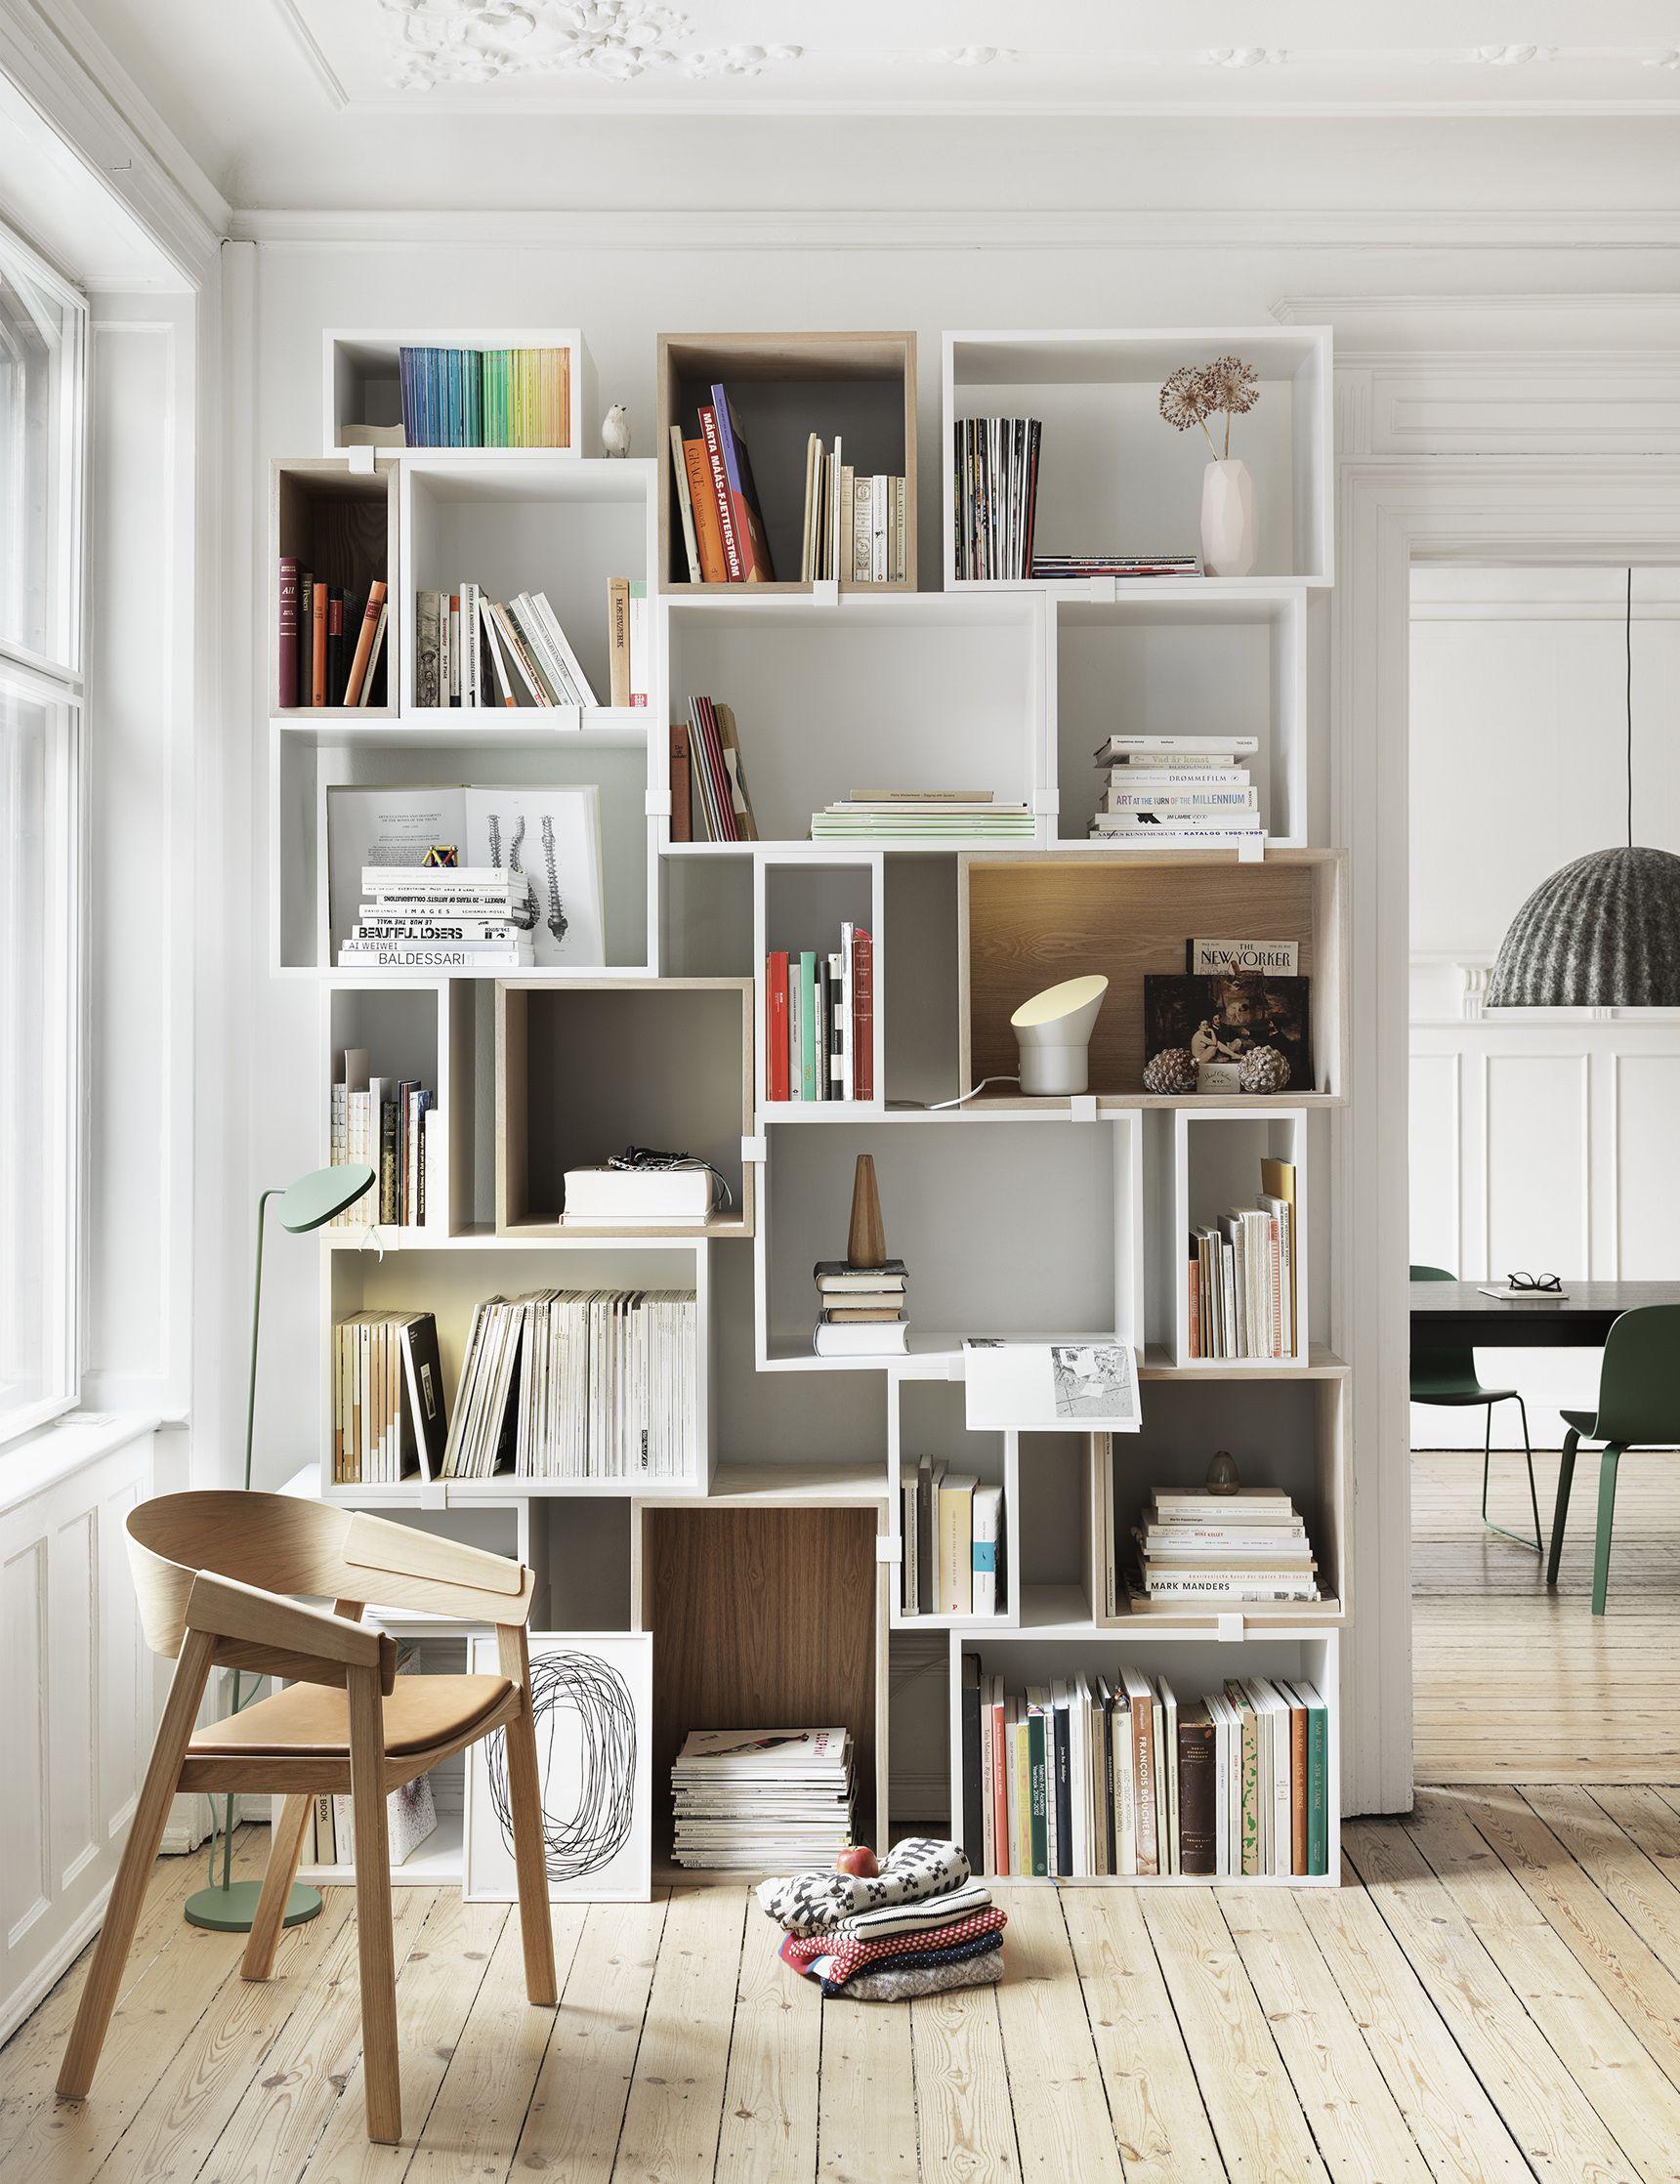 Merveilleux The Best DIY Projects U0026 DIY Ideas And Tutorials: Sewing, Paper Craft, DIY.  Best DIY Furniture U0026 Shelf Ideas 2017 / 2018 Muuto Stacked Shelf Wishlist   Read ...